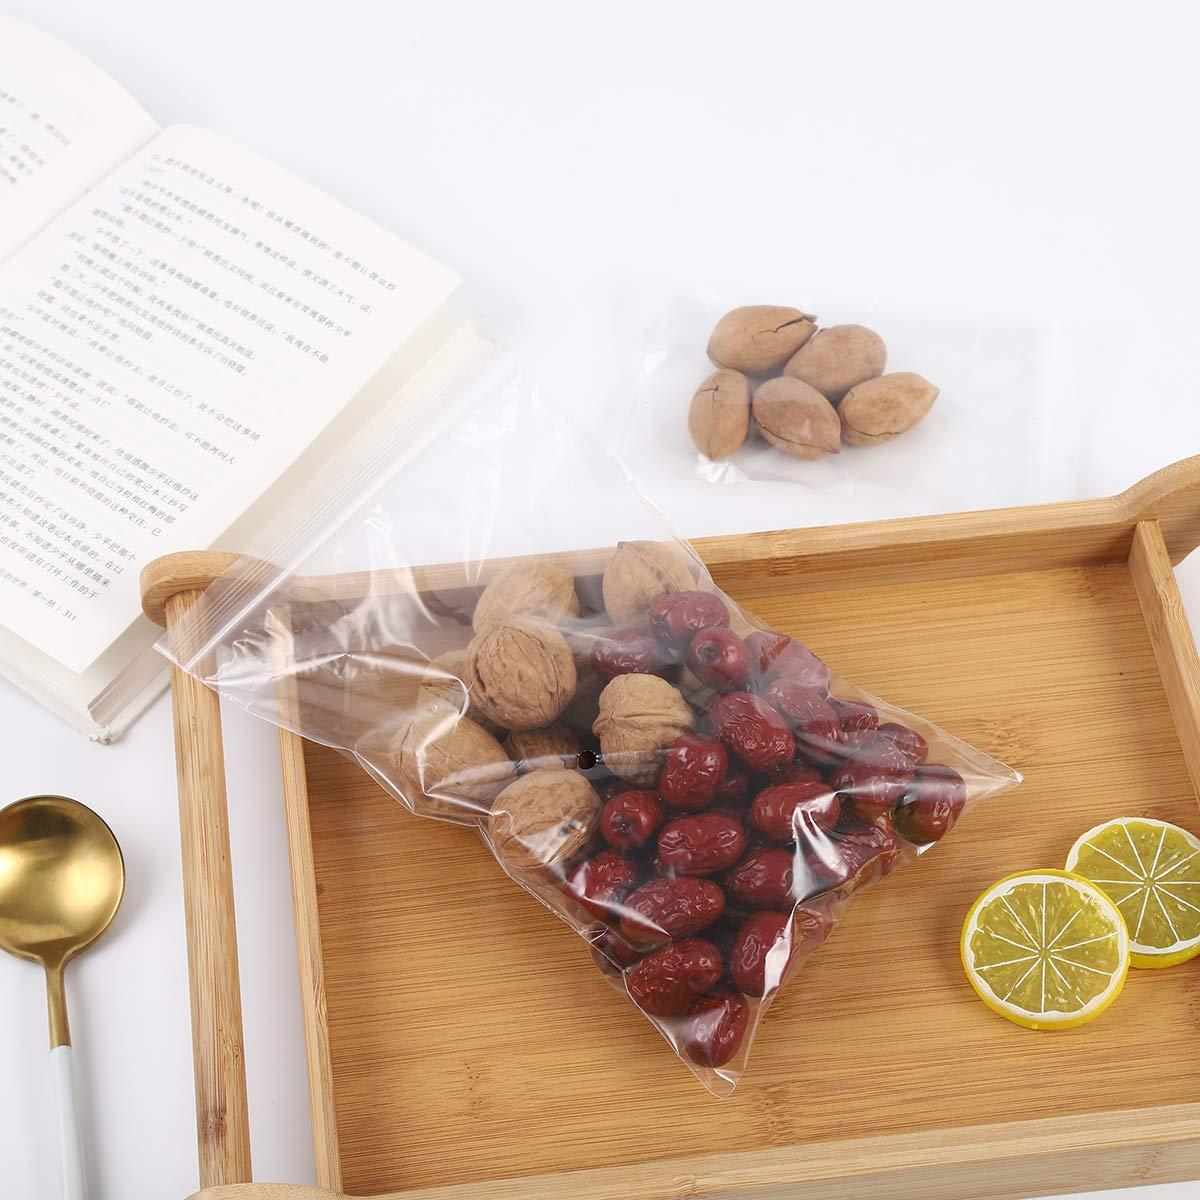 ZULANI Small Resealable Plastic Bags 3